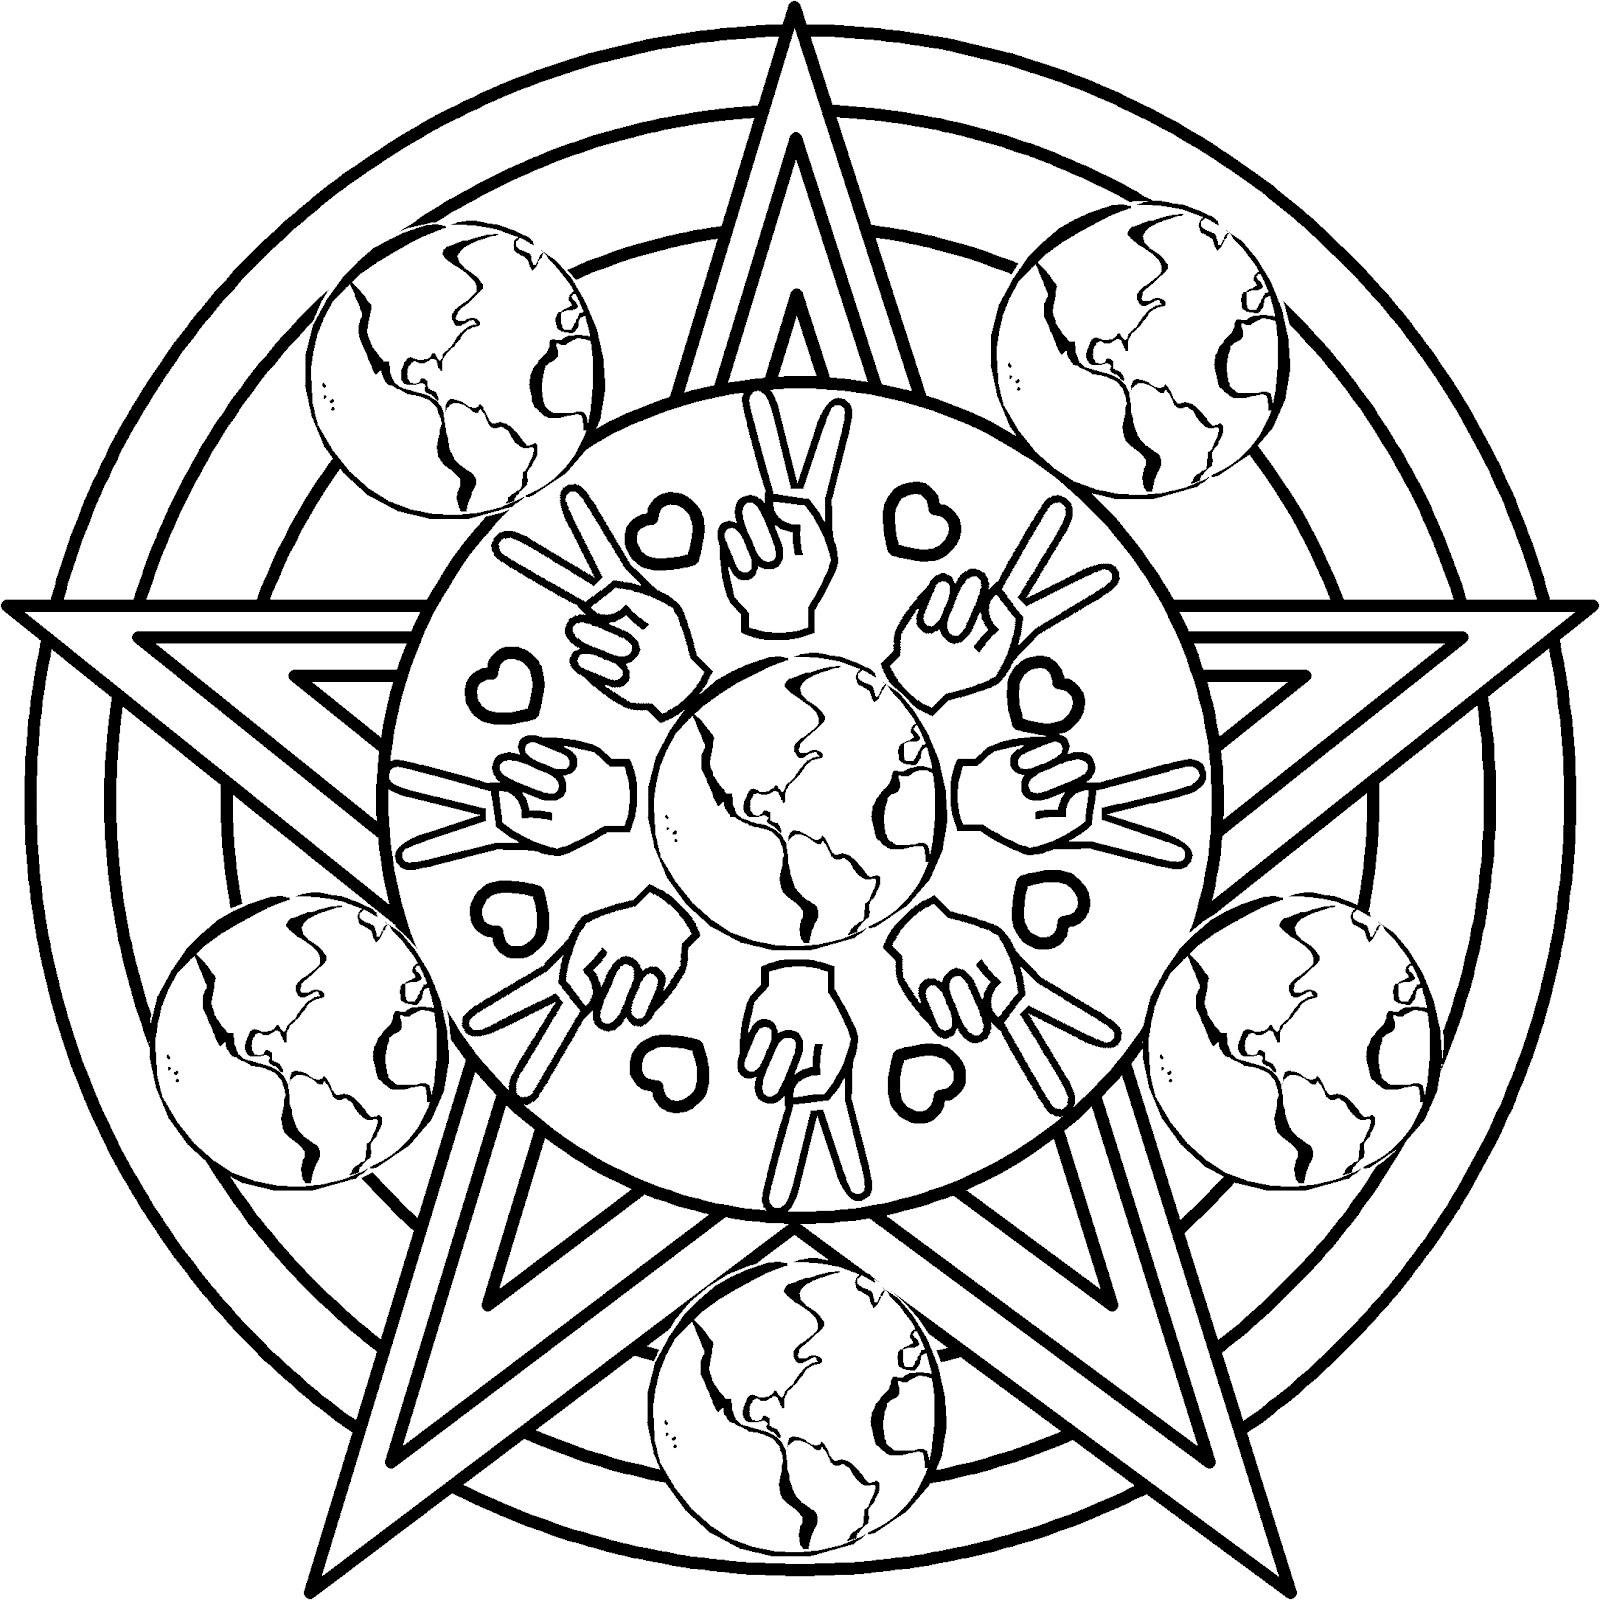 Drawn peace sign coloring picture Earth day day Mandala Mandala